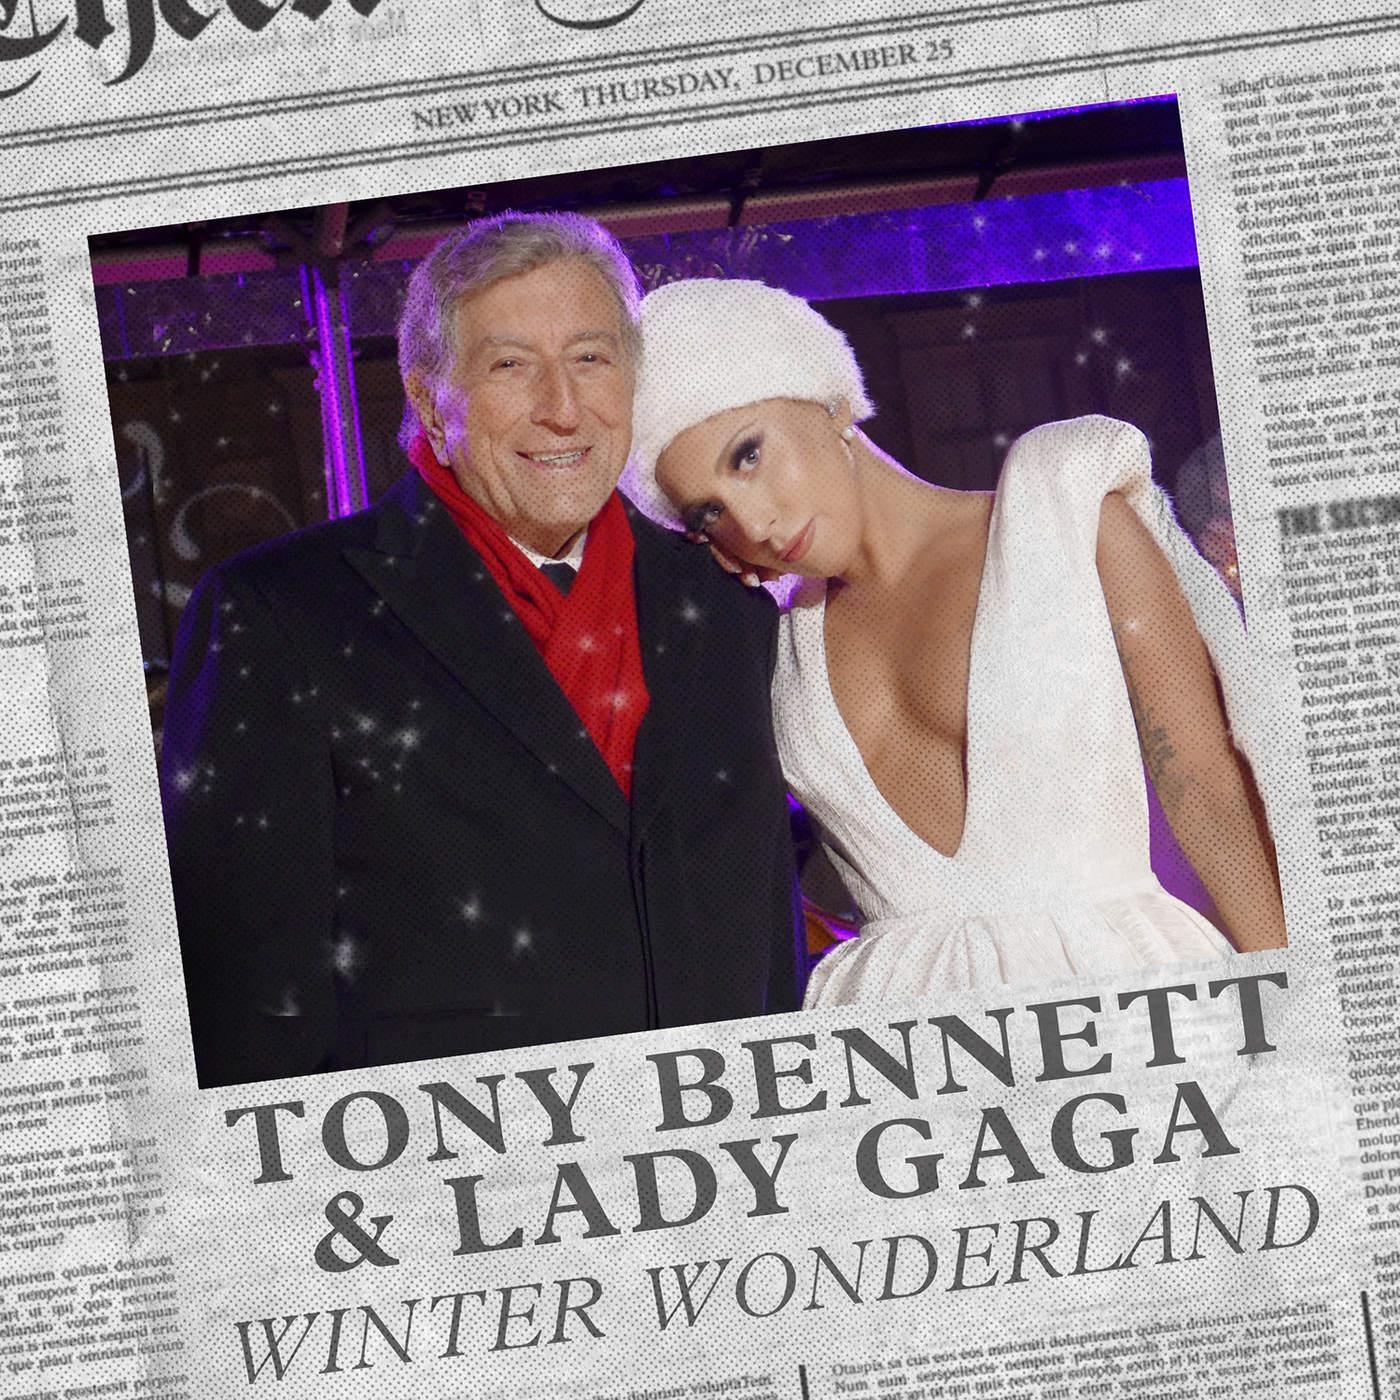 Winter Wonderland (song)